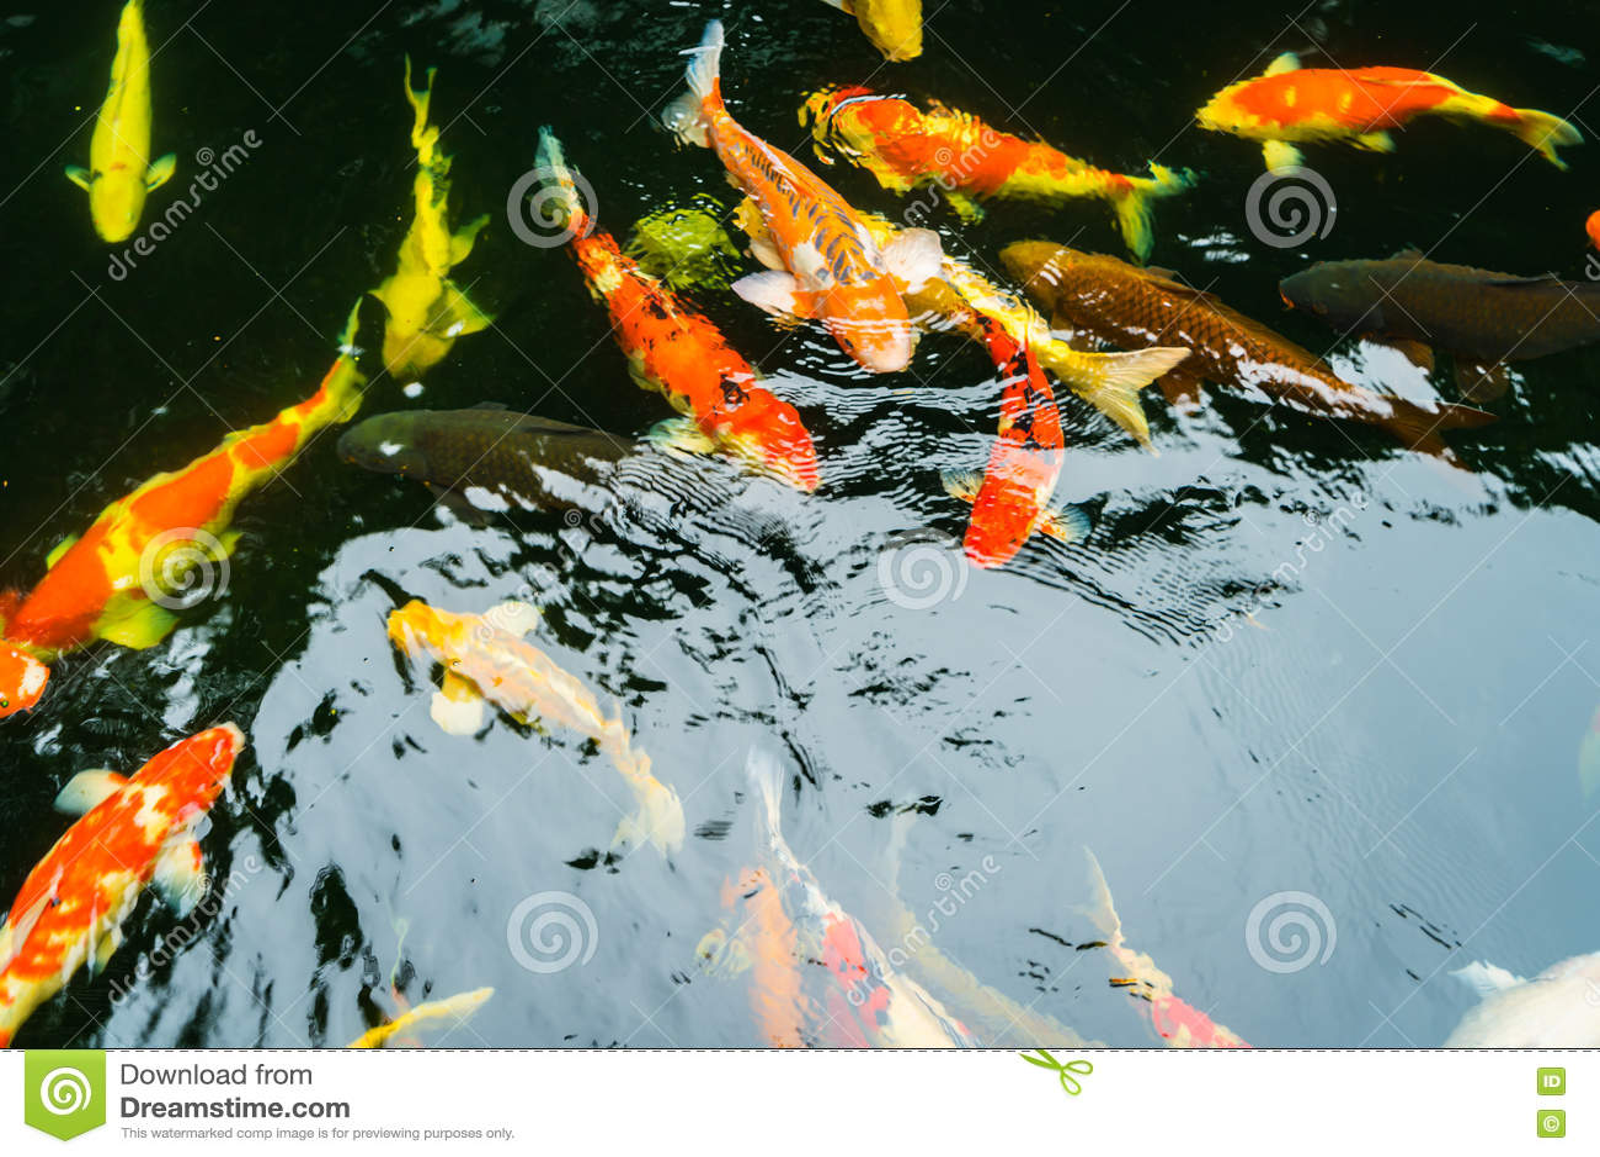 Colorful koi fish swimming in water stock image for Koi fish dealers